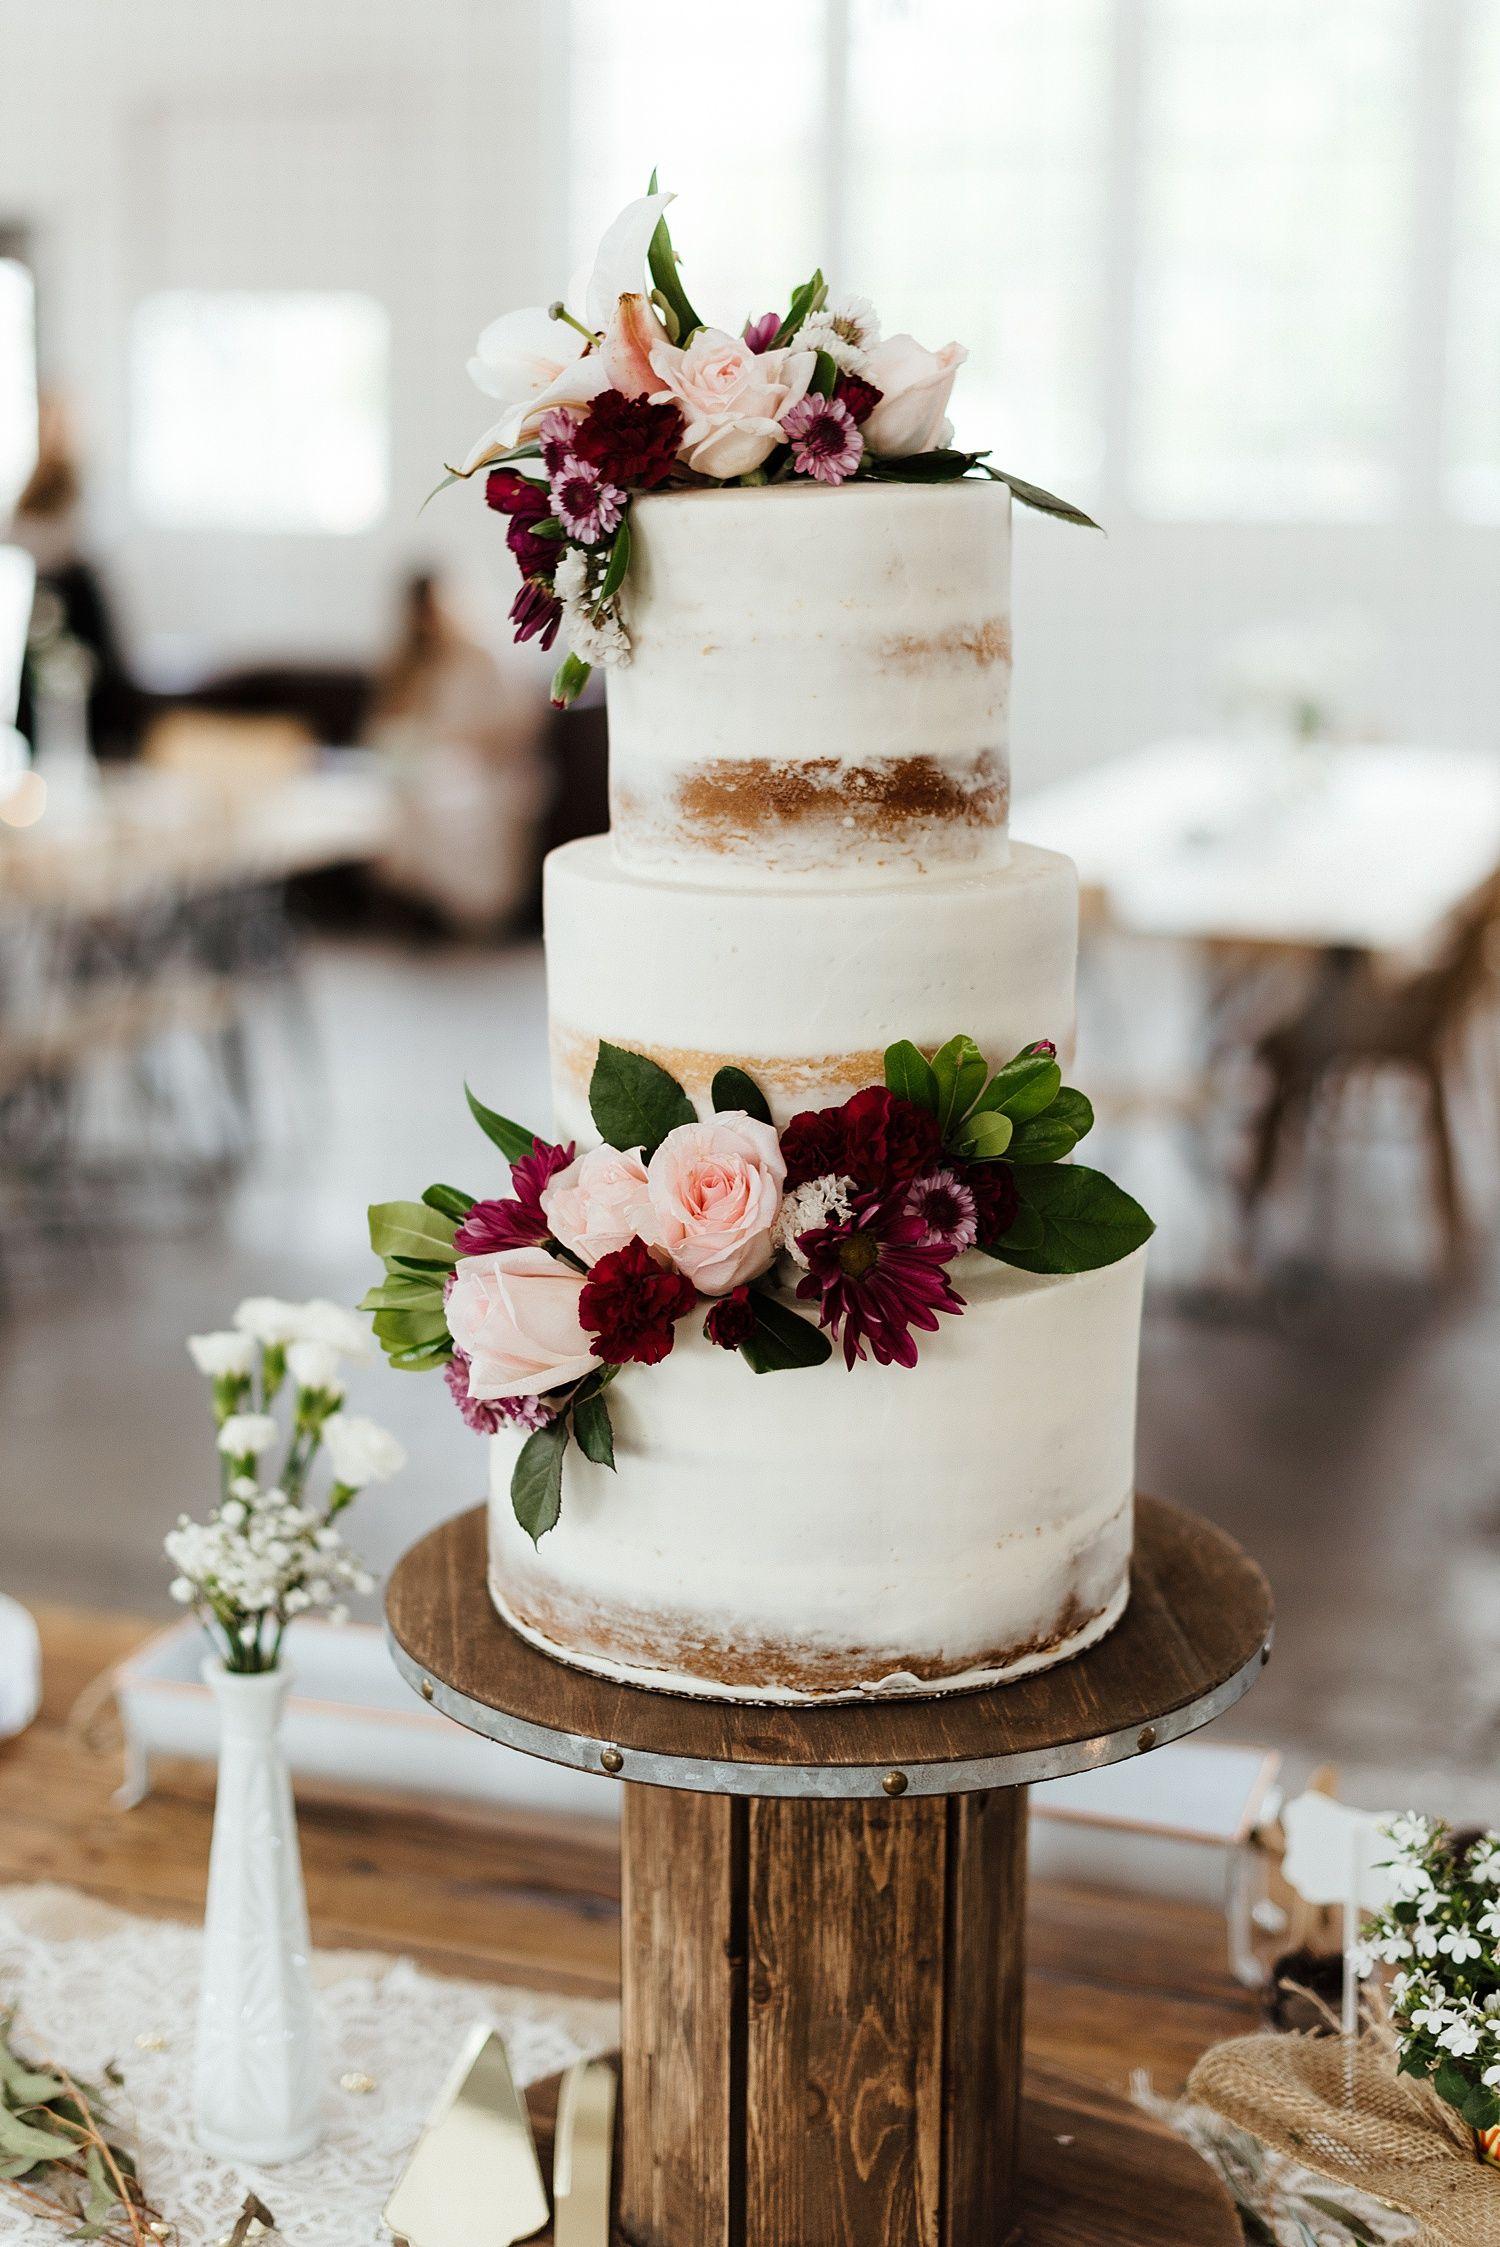 Wedding Gallery Spring Wedding Cake Country Wedding Cakes